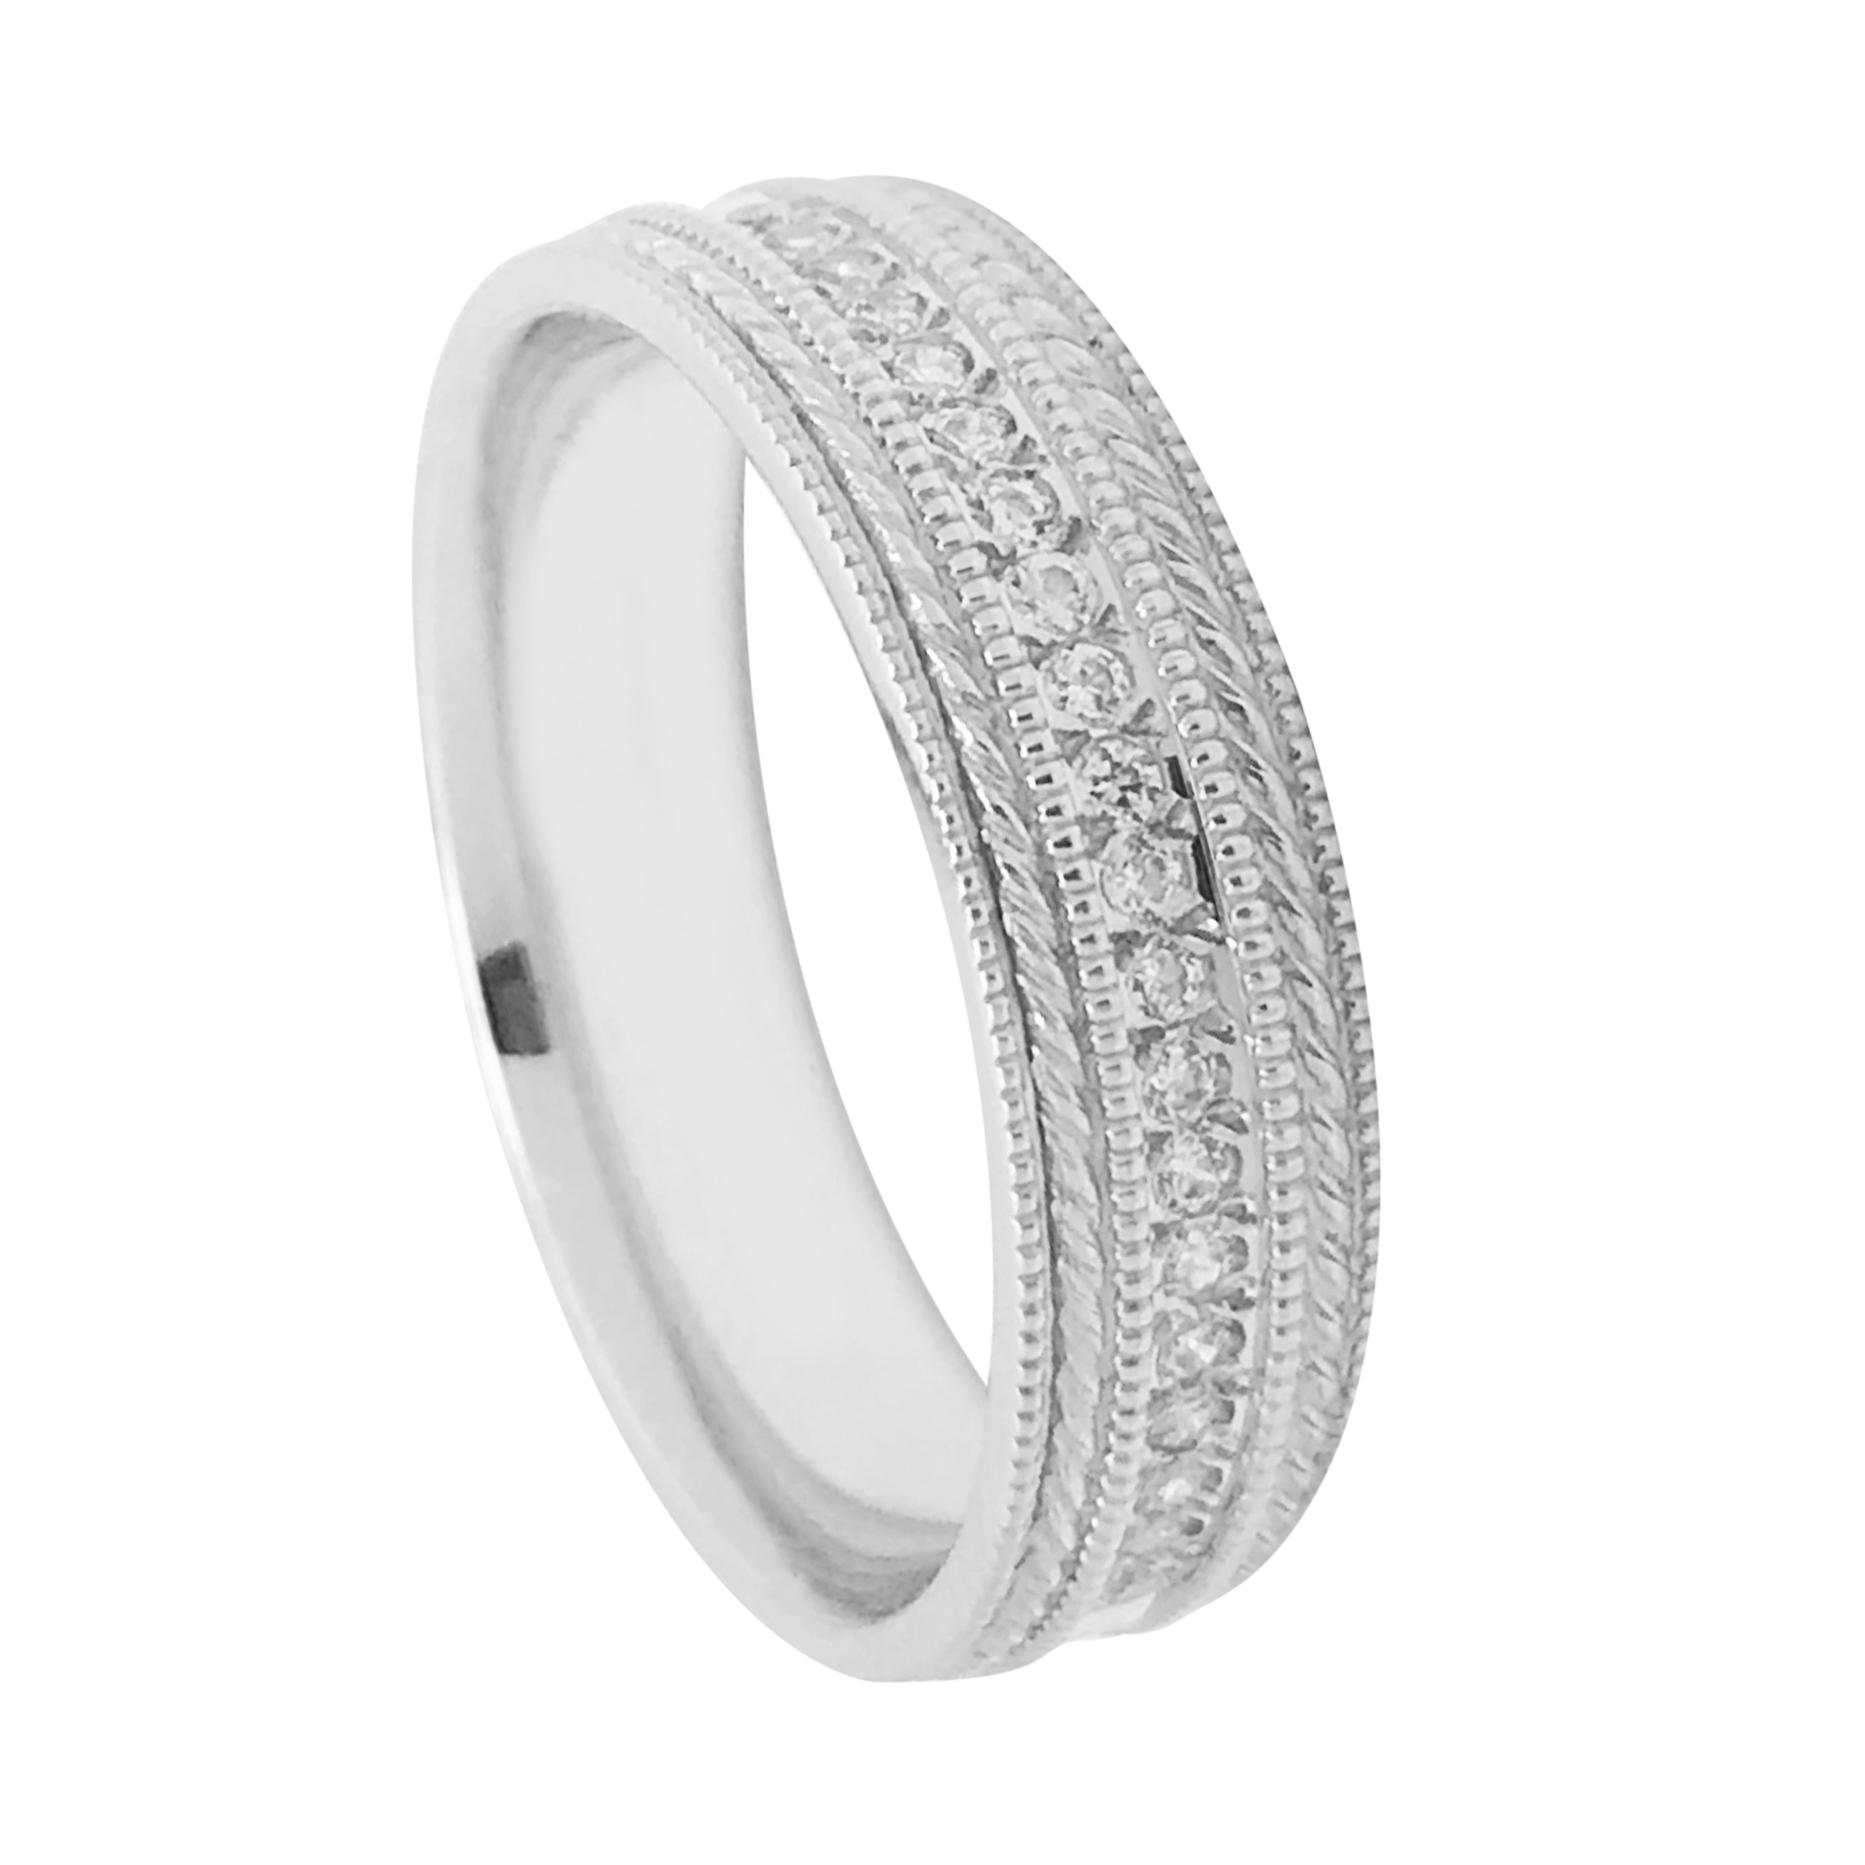 Channel Set Diamond Wedding Band With Milgrain Detail